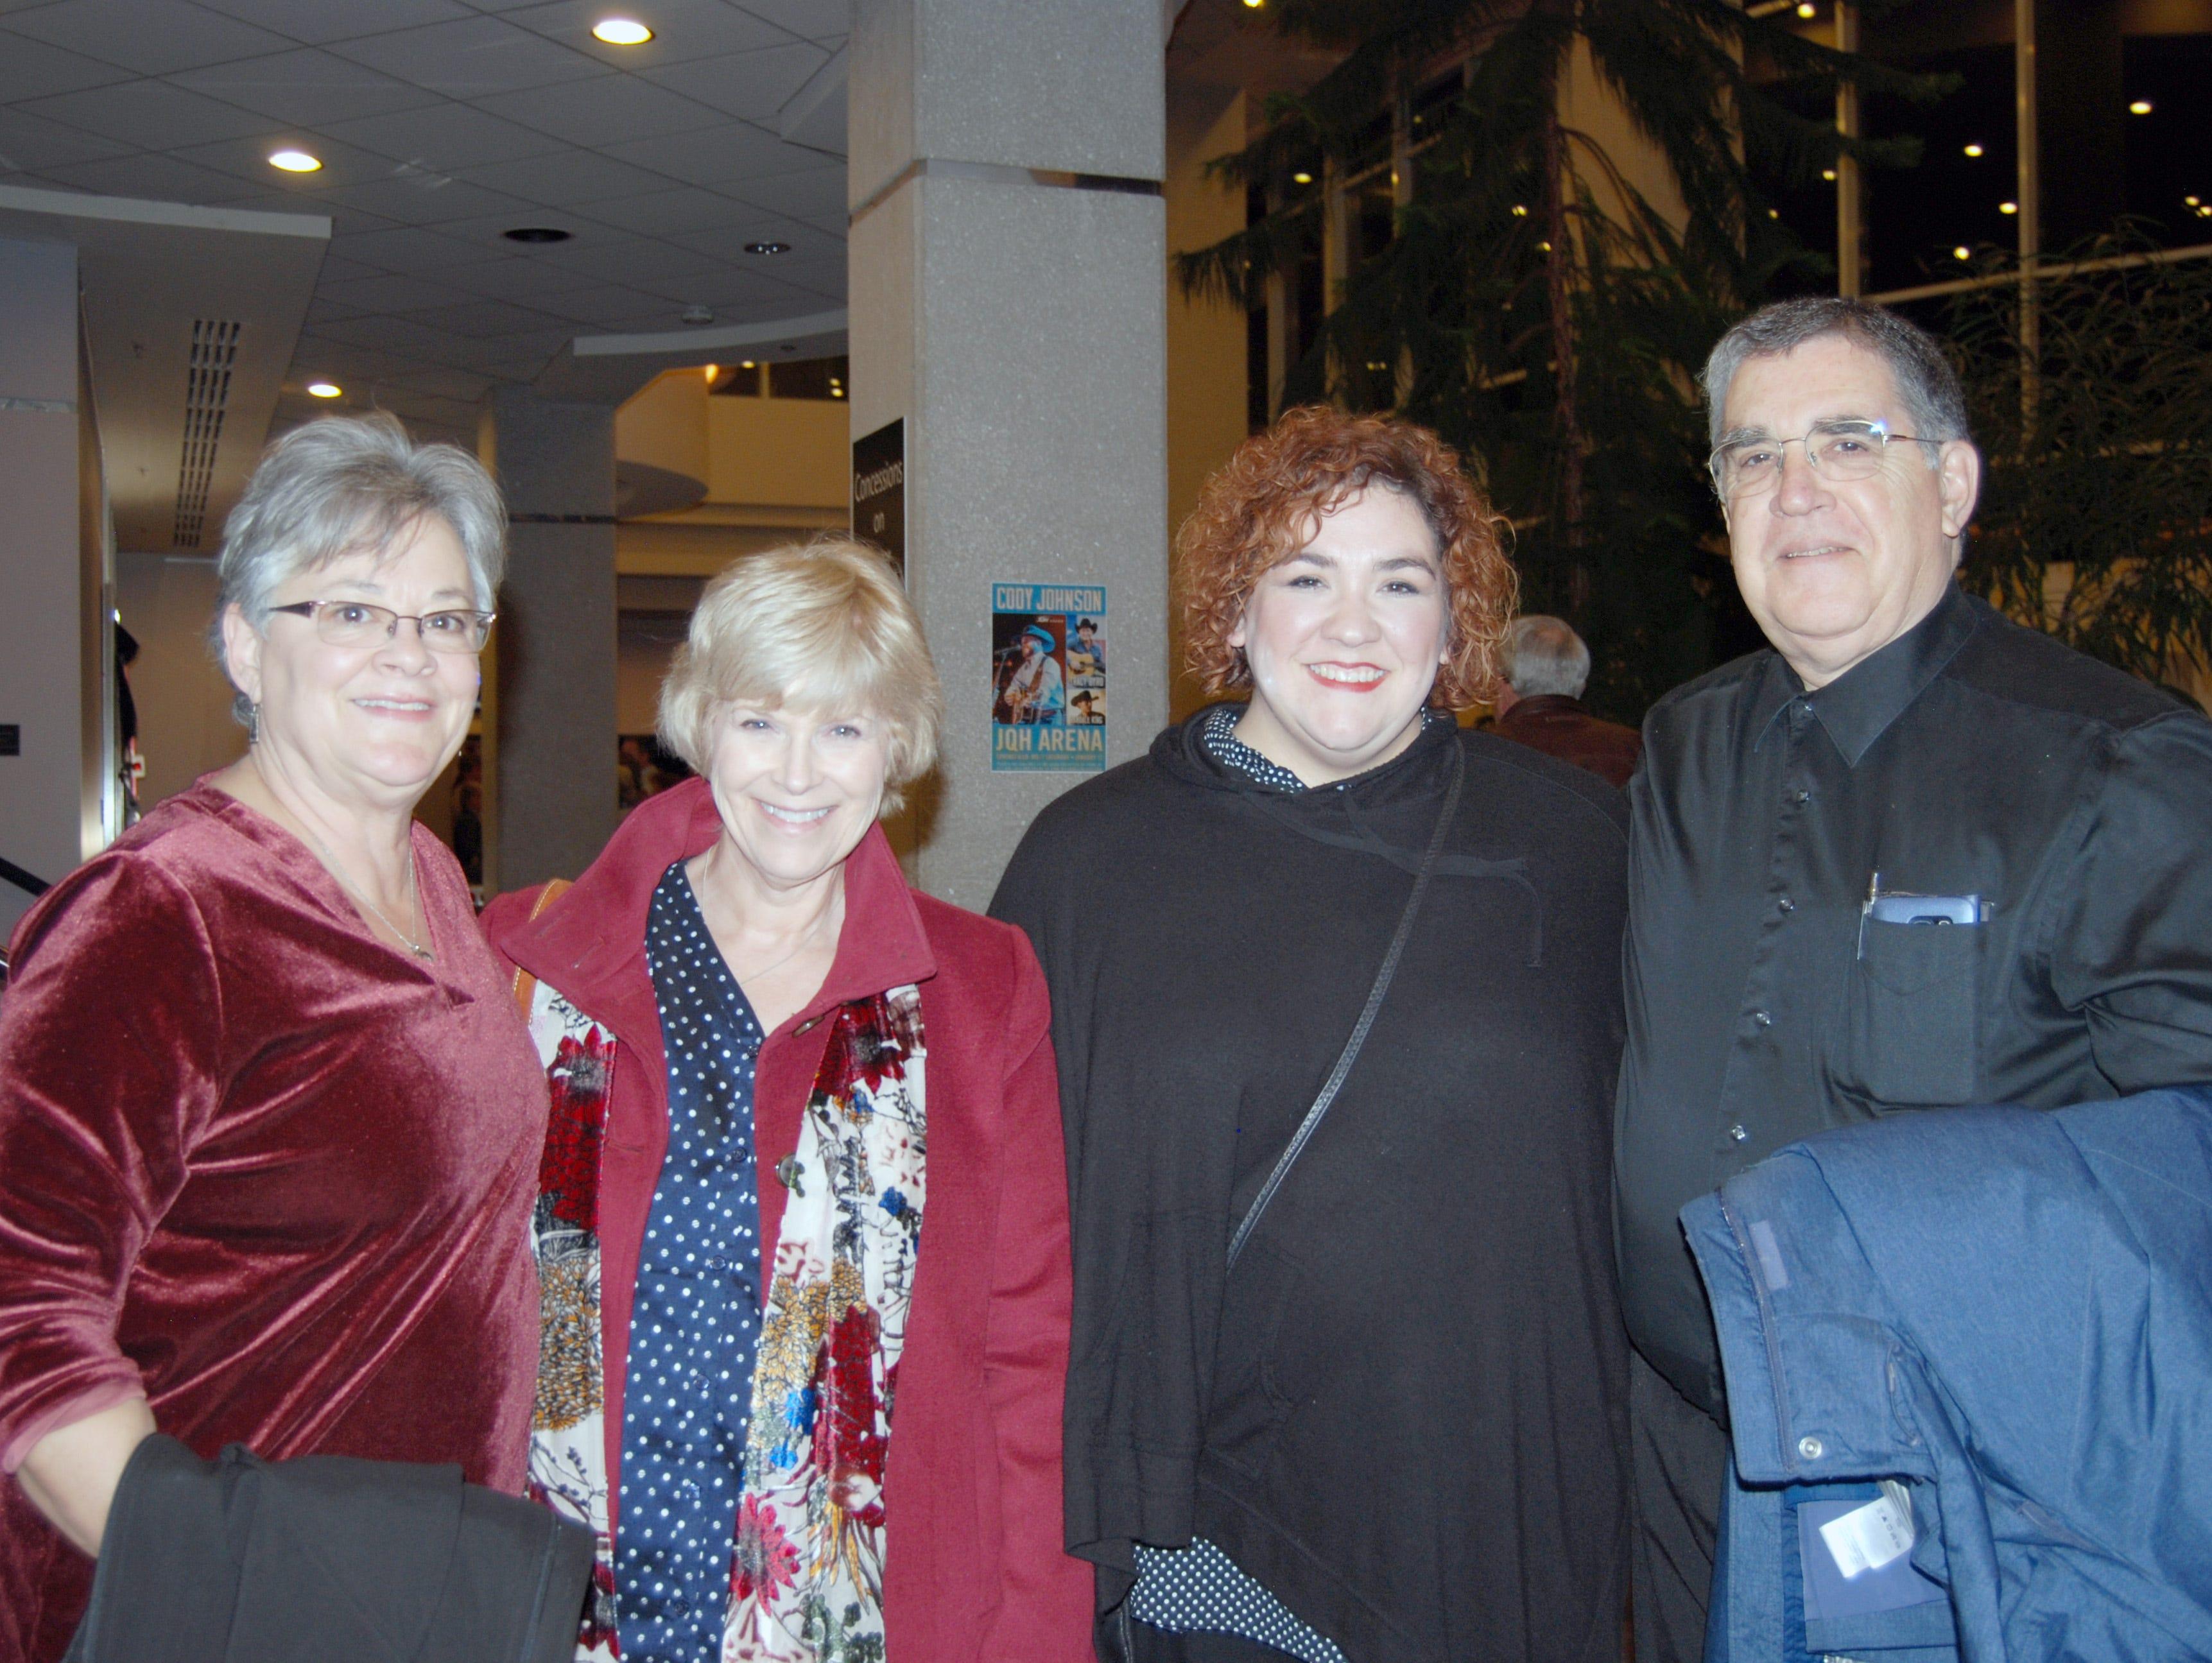 Susan Dollar, Deb McFarland, Angela and David Kingsnder